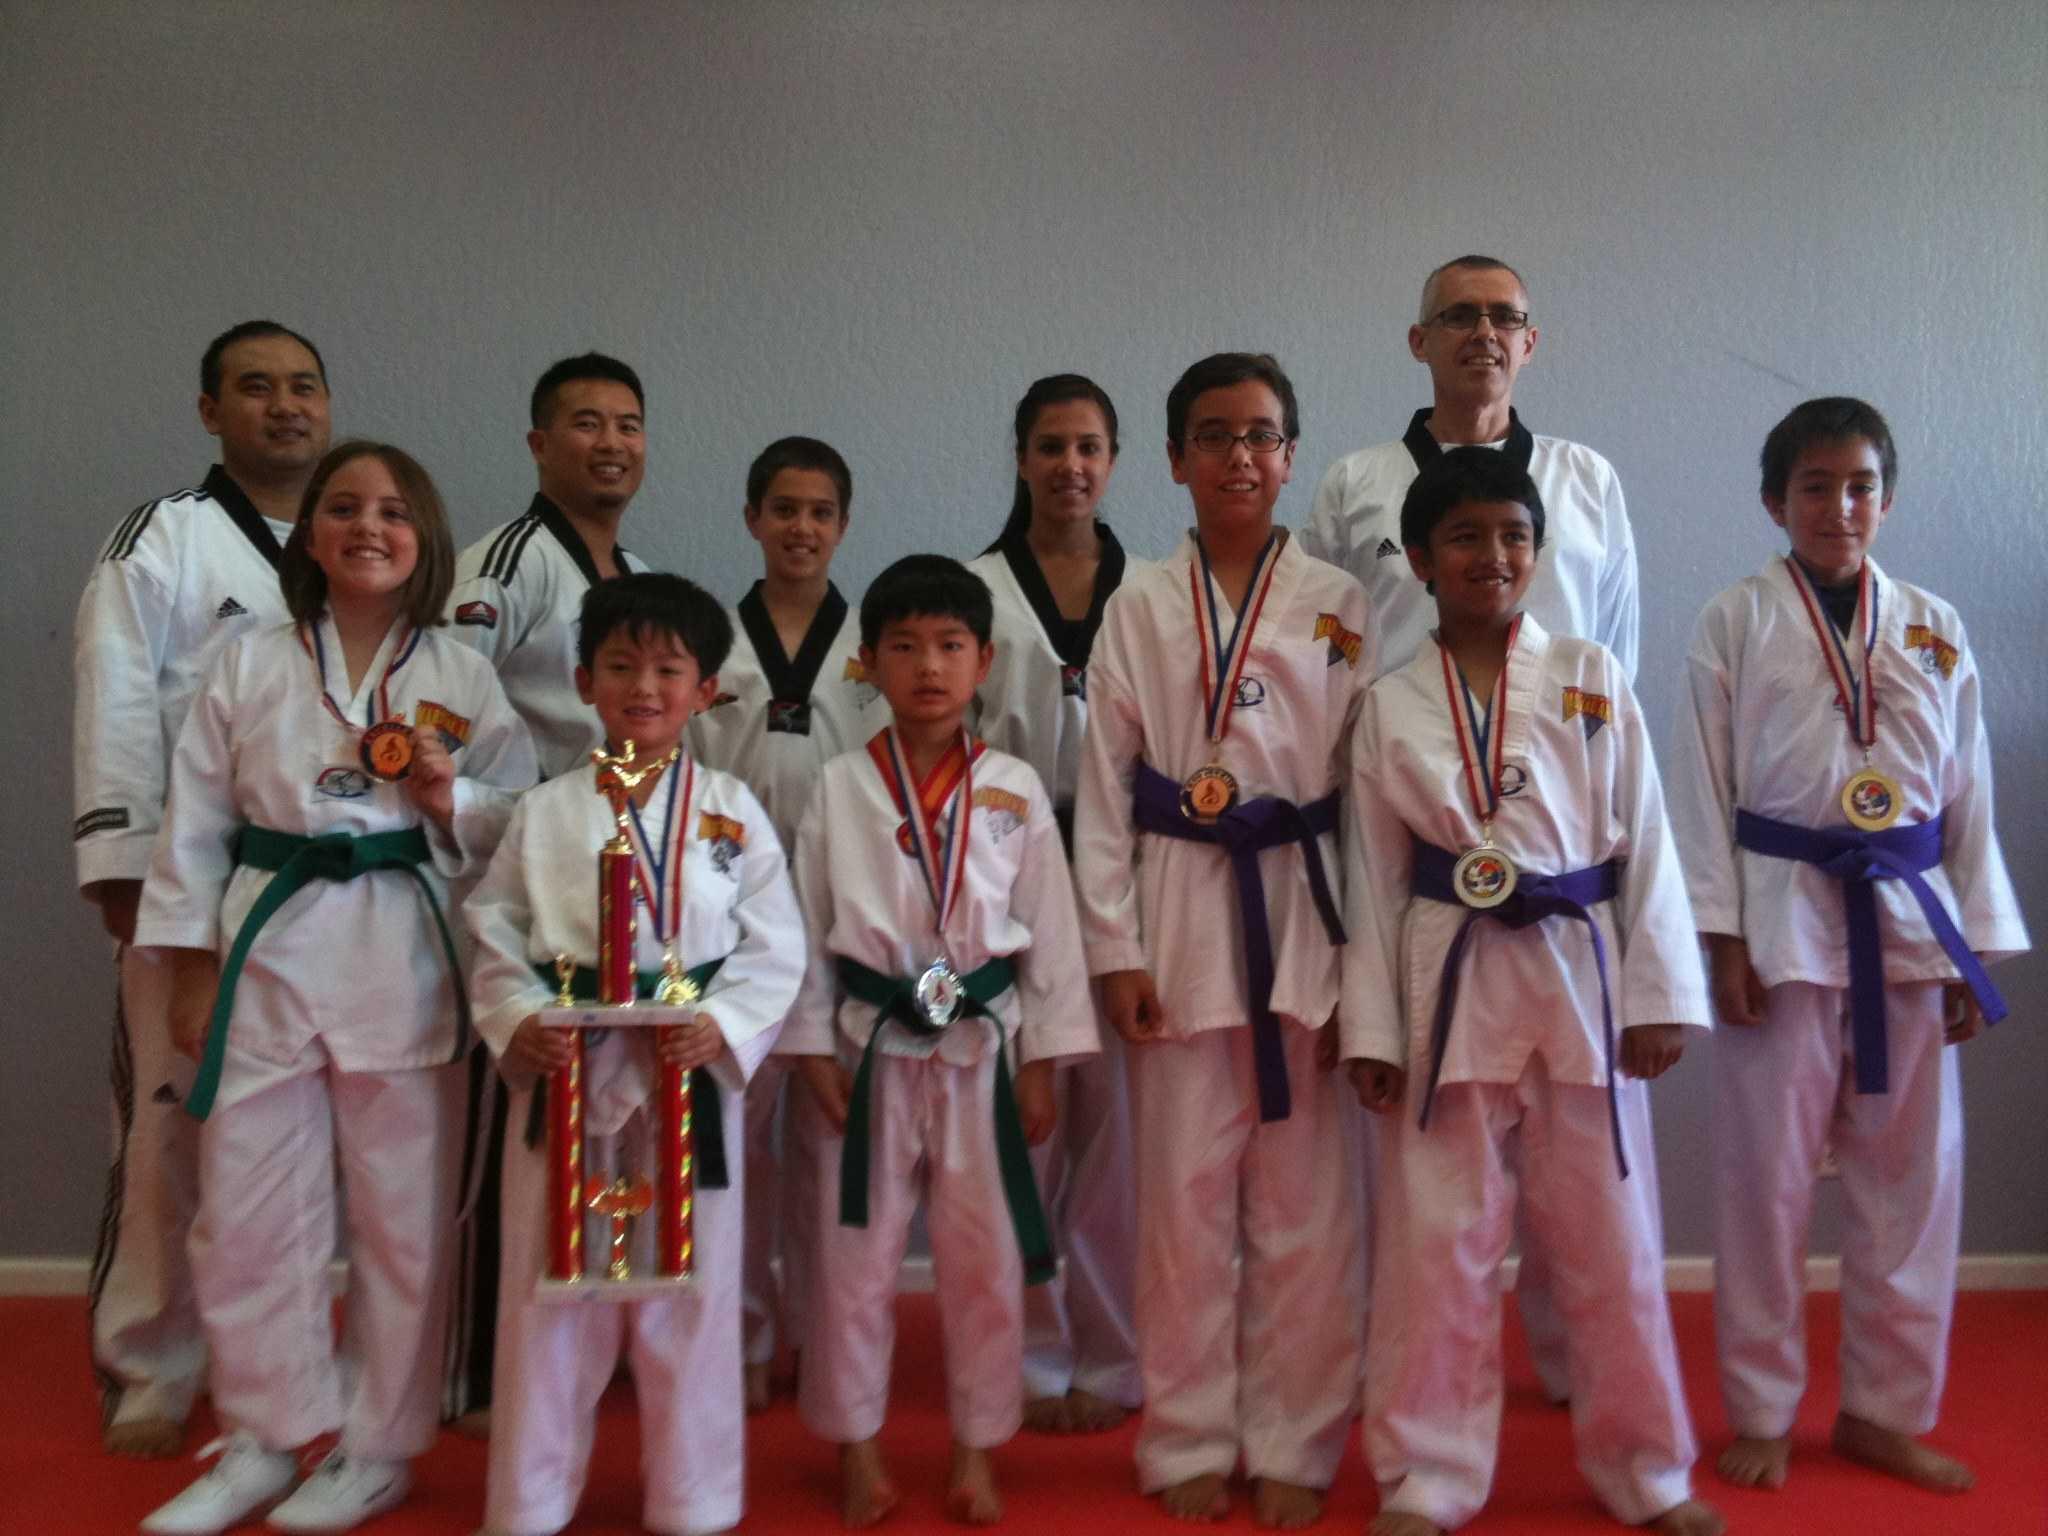 Taekwondo provides Freshman Elijah Schacter chance to embrace culture